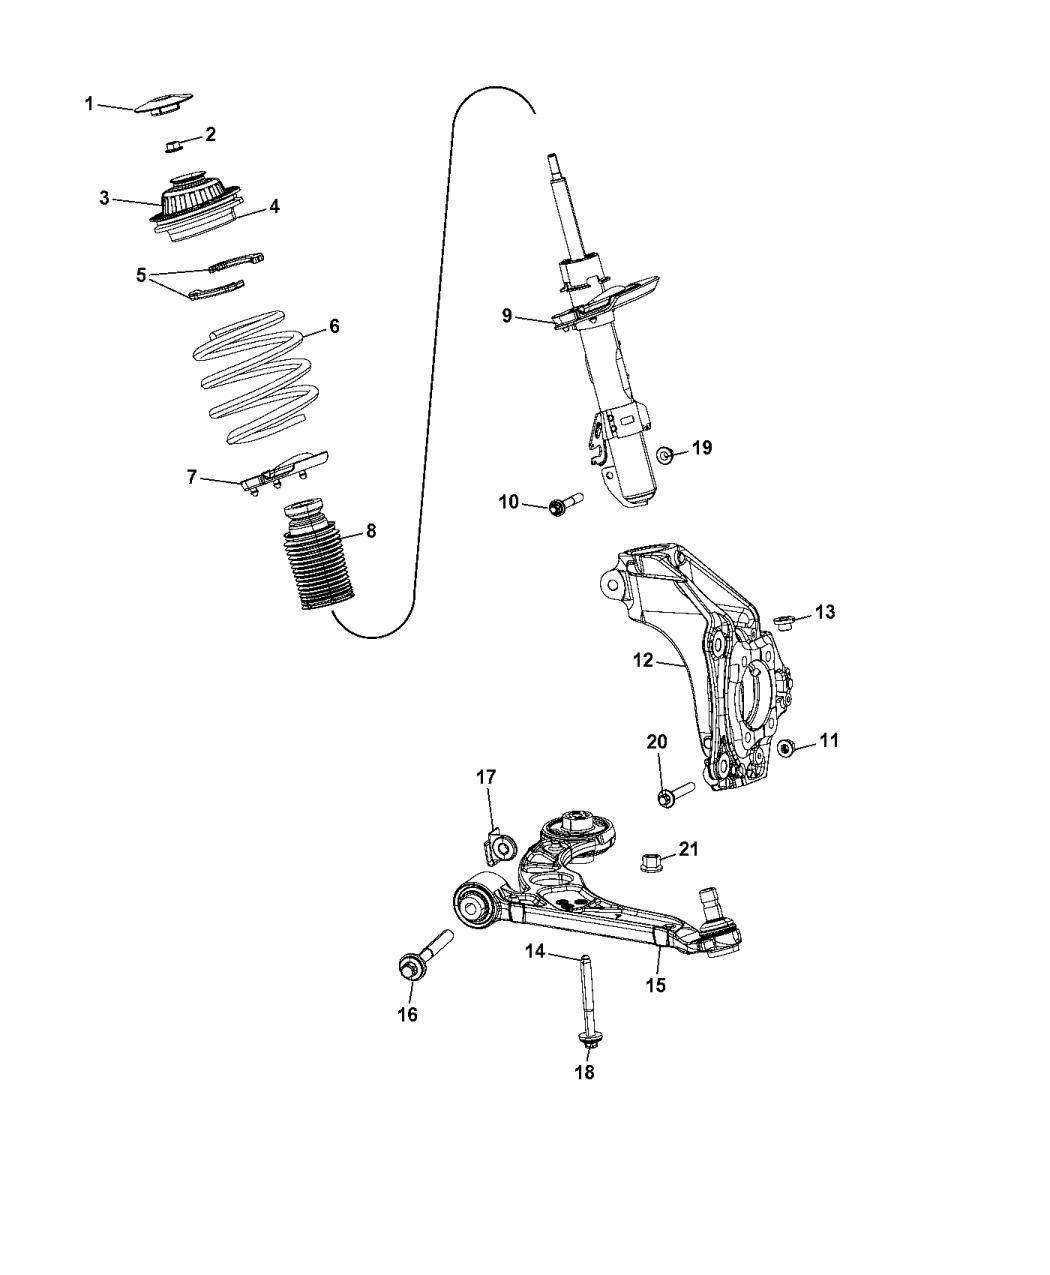 2016 Chrysler 200 Suspension